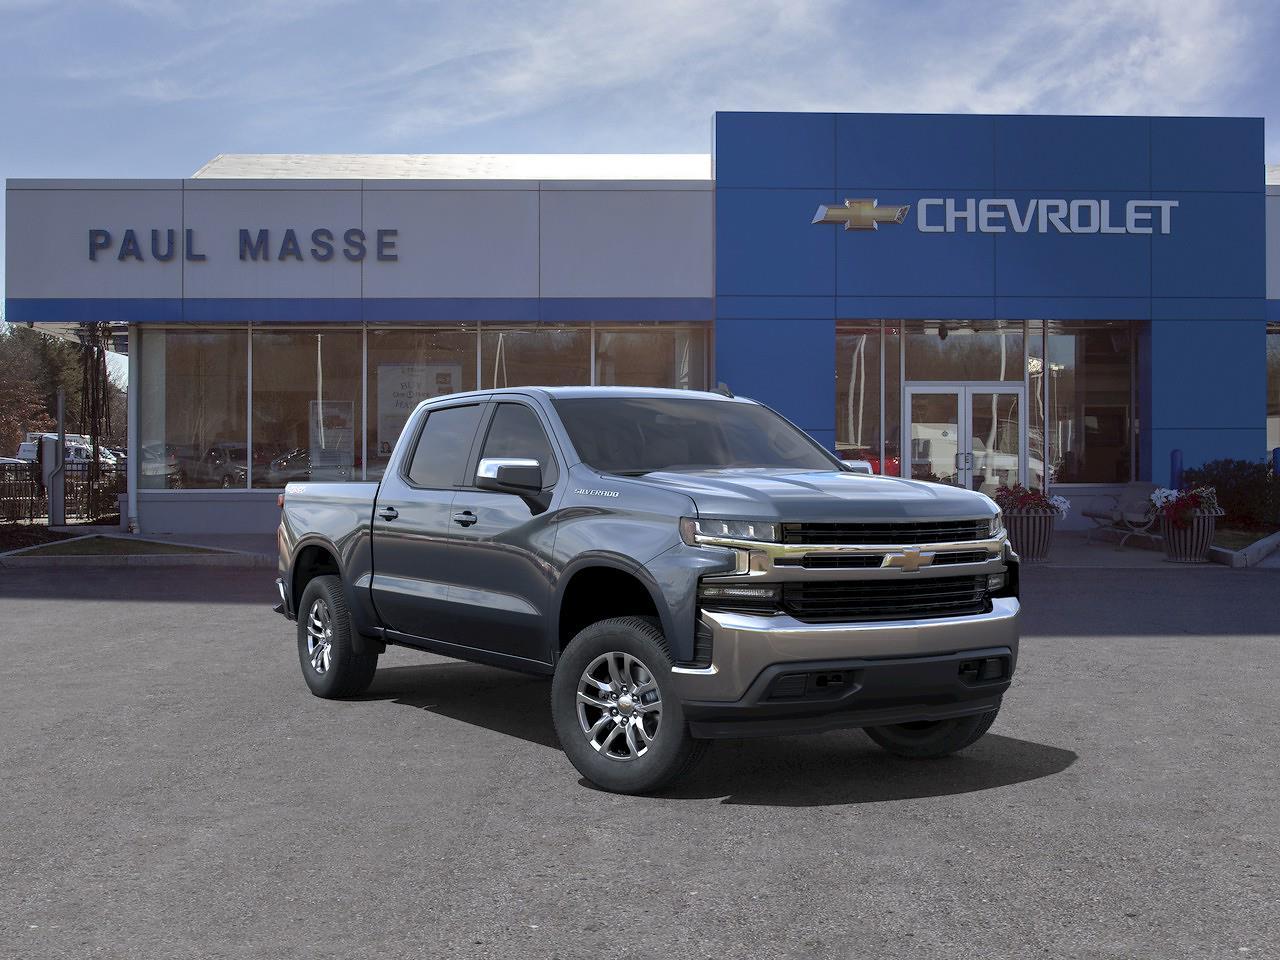 2021 Chevrolet Silverado 1500 4x4, Pickup #CK1530 - photo 1